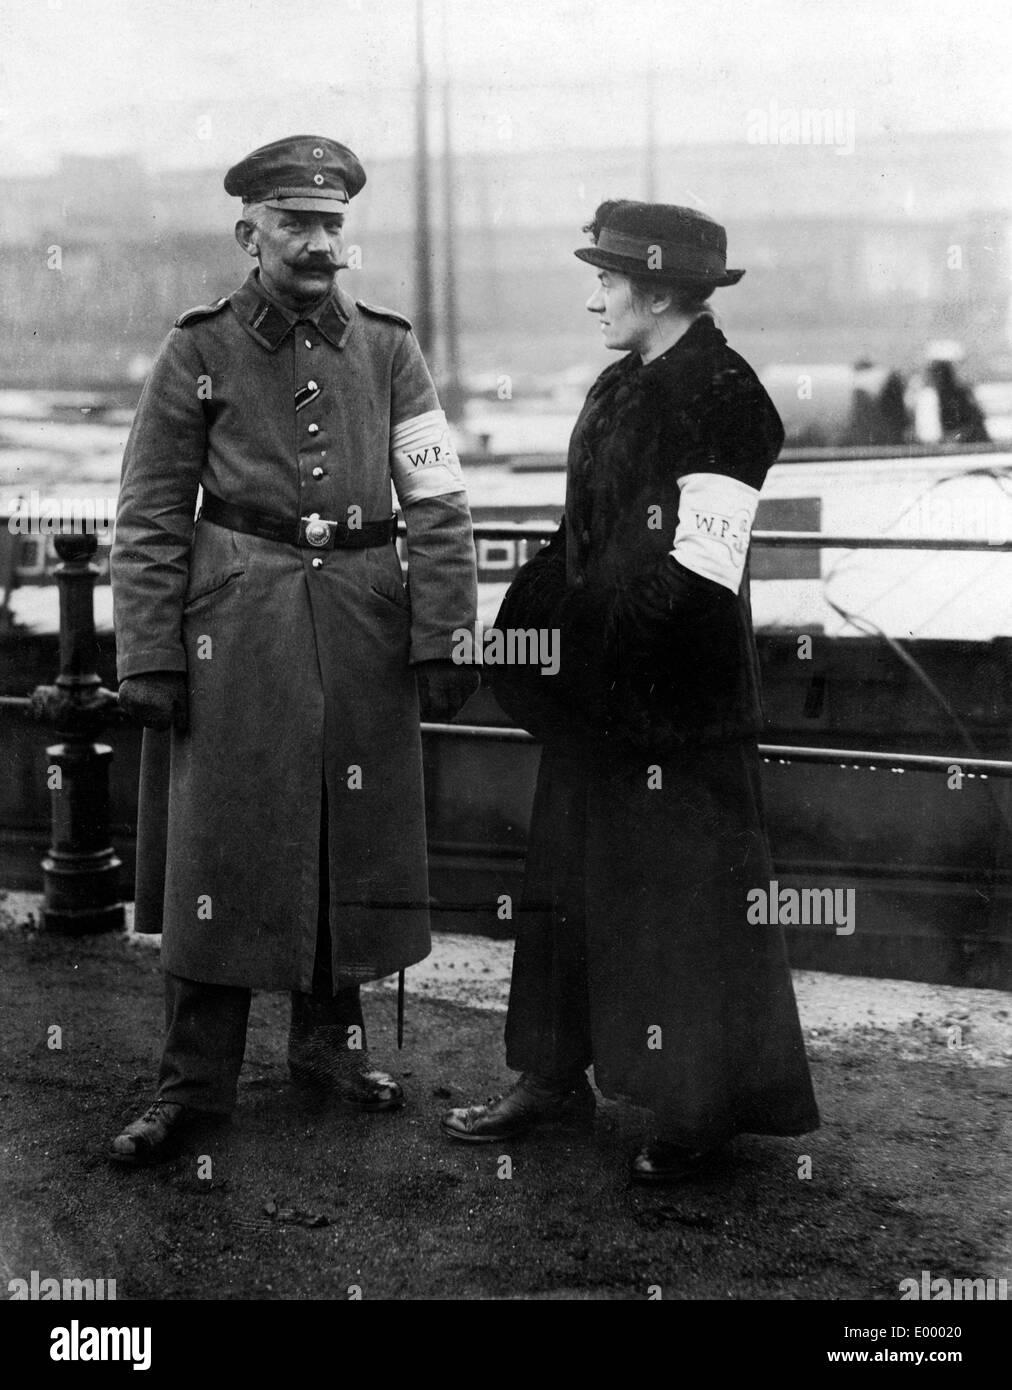 Members of the German water police, 1917 Stock Photo